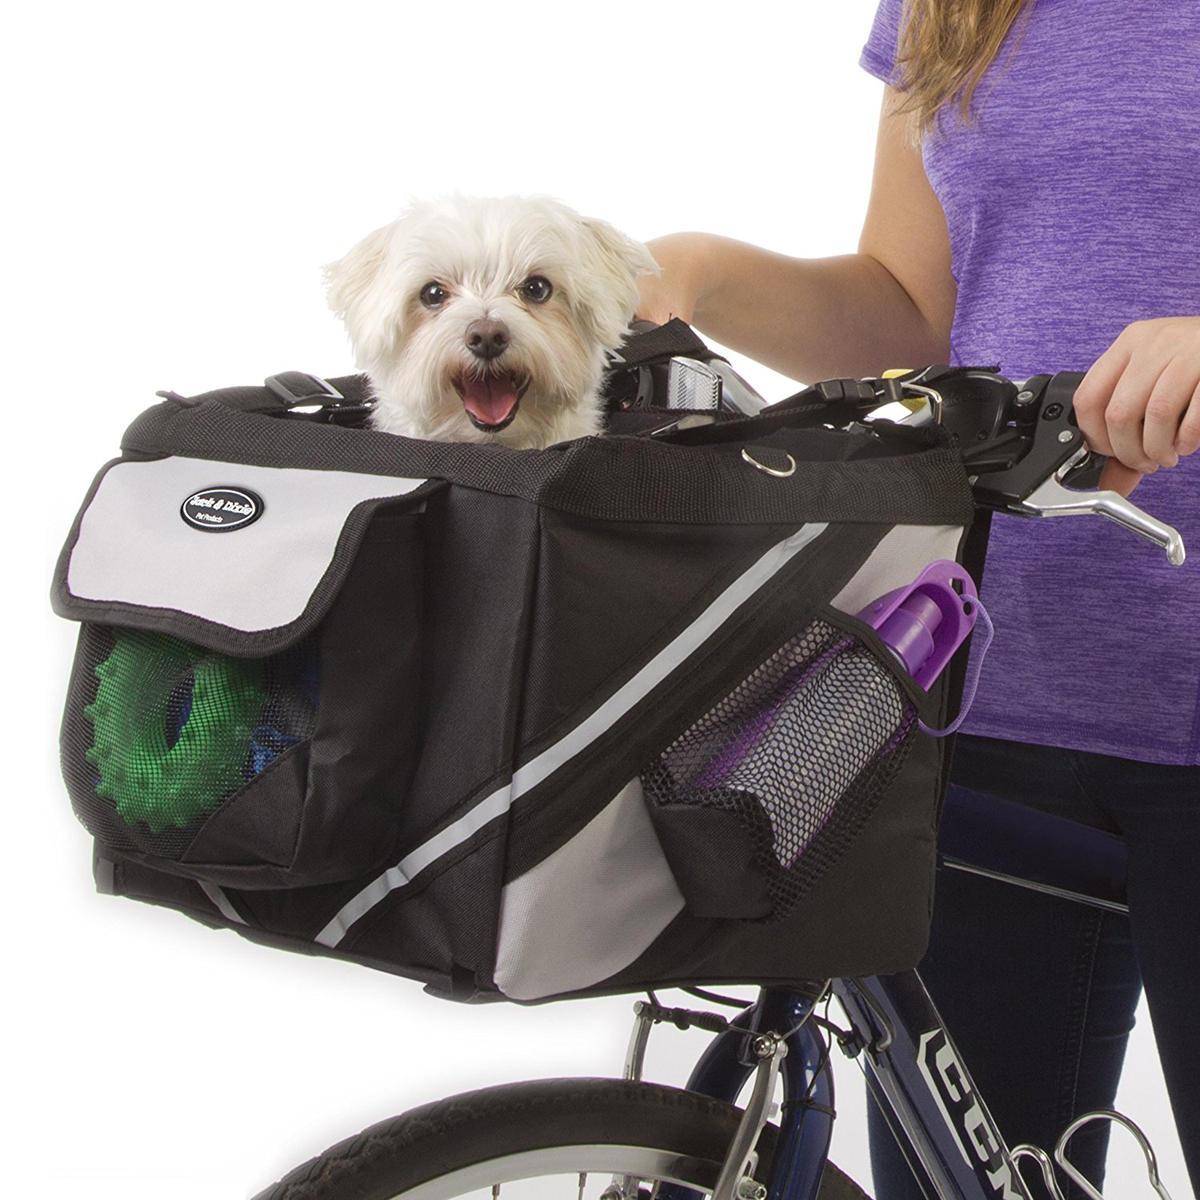 Pet Puppy Bicycle Basket Storage Puppy Ride Bike Canopy Dog Cat Carrier Safety Bike Basket